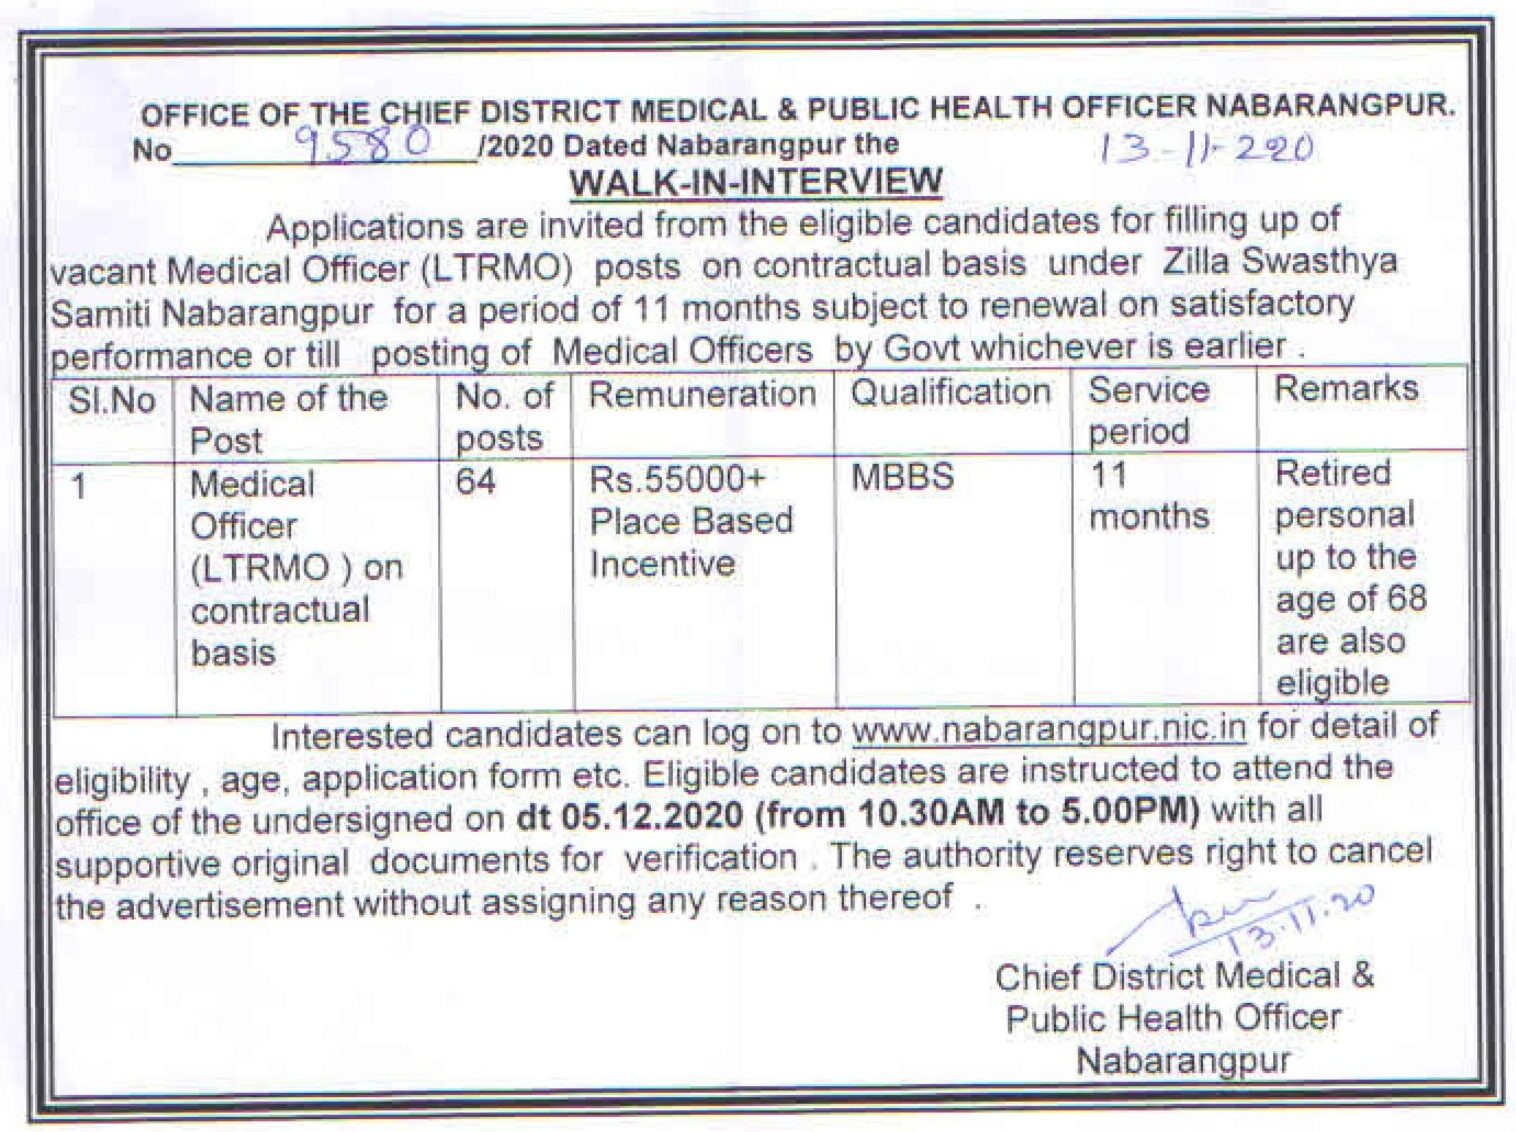 Nabarangpur CDMO Office Recruitment 2020